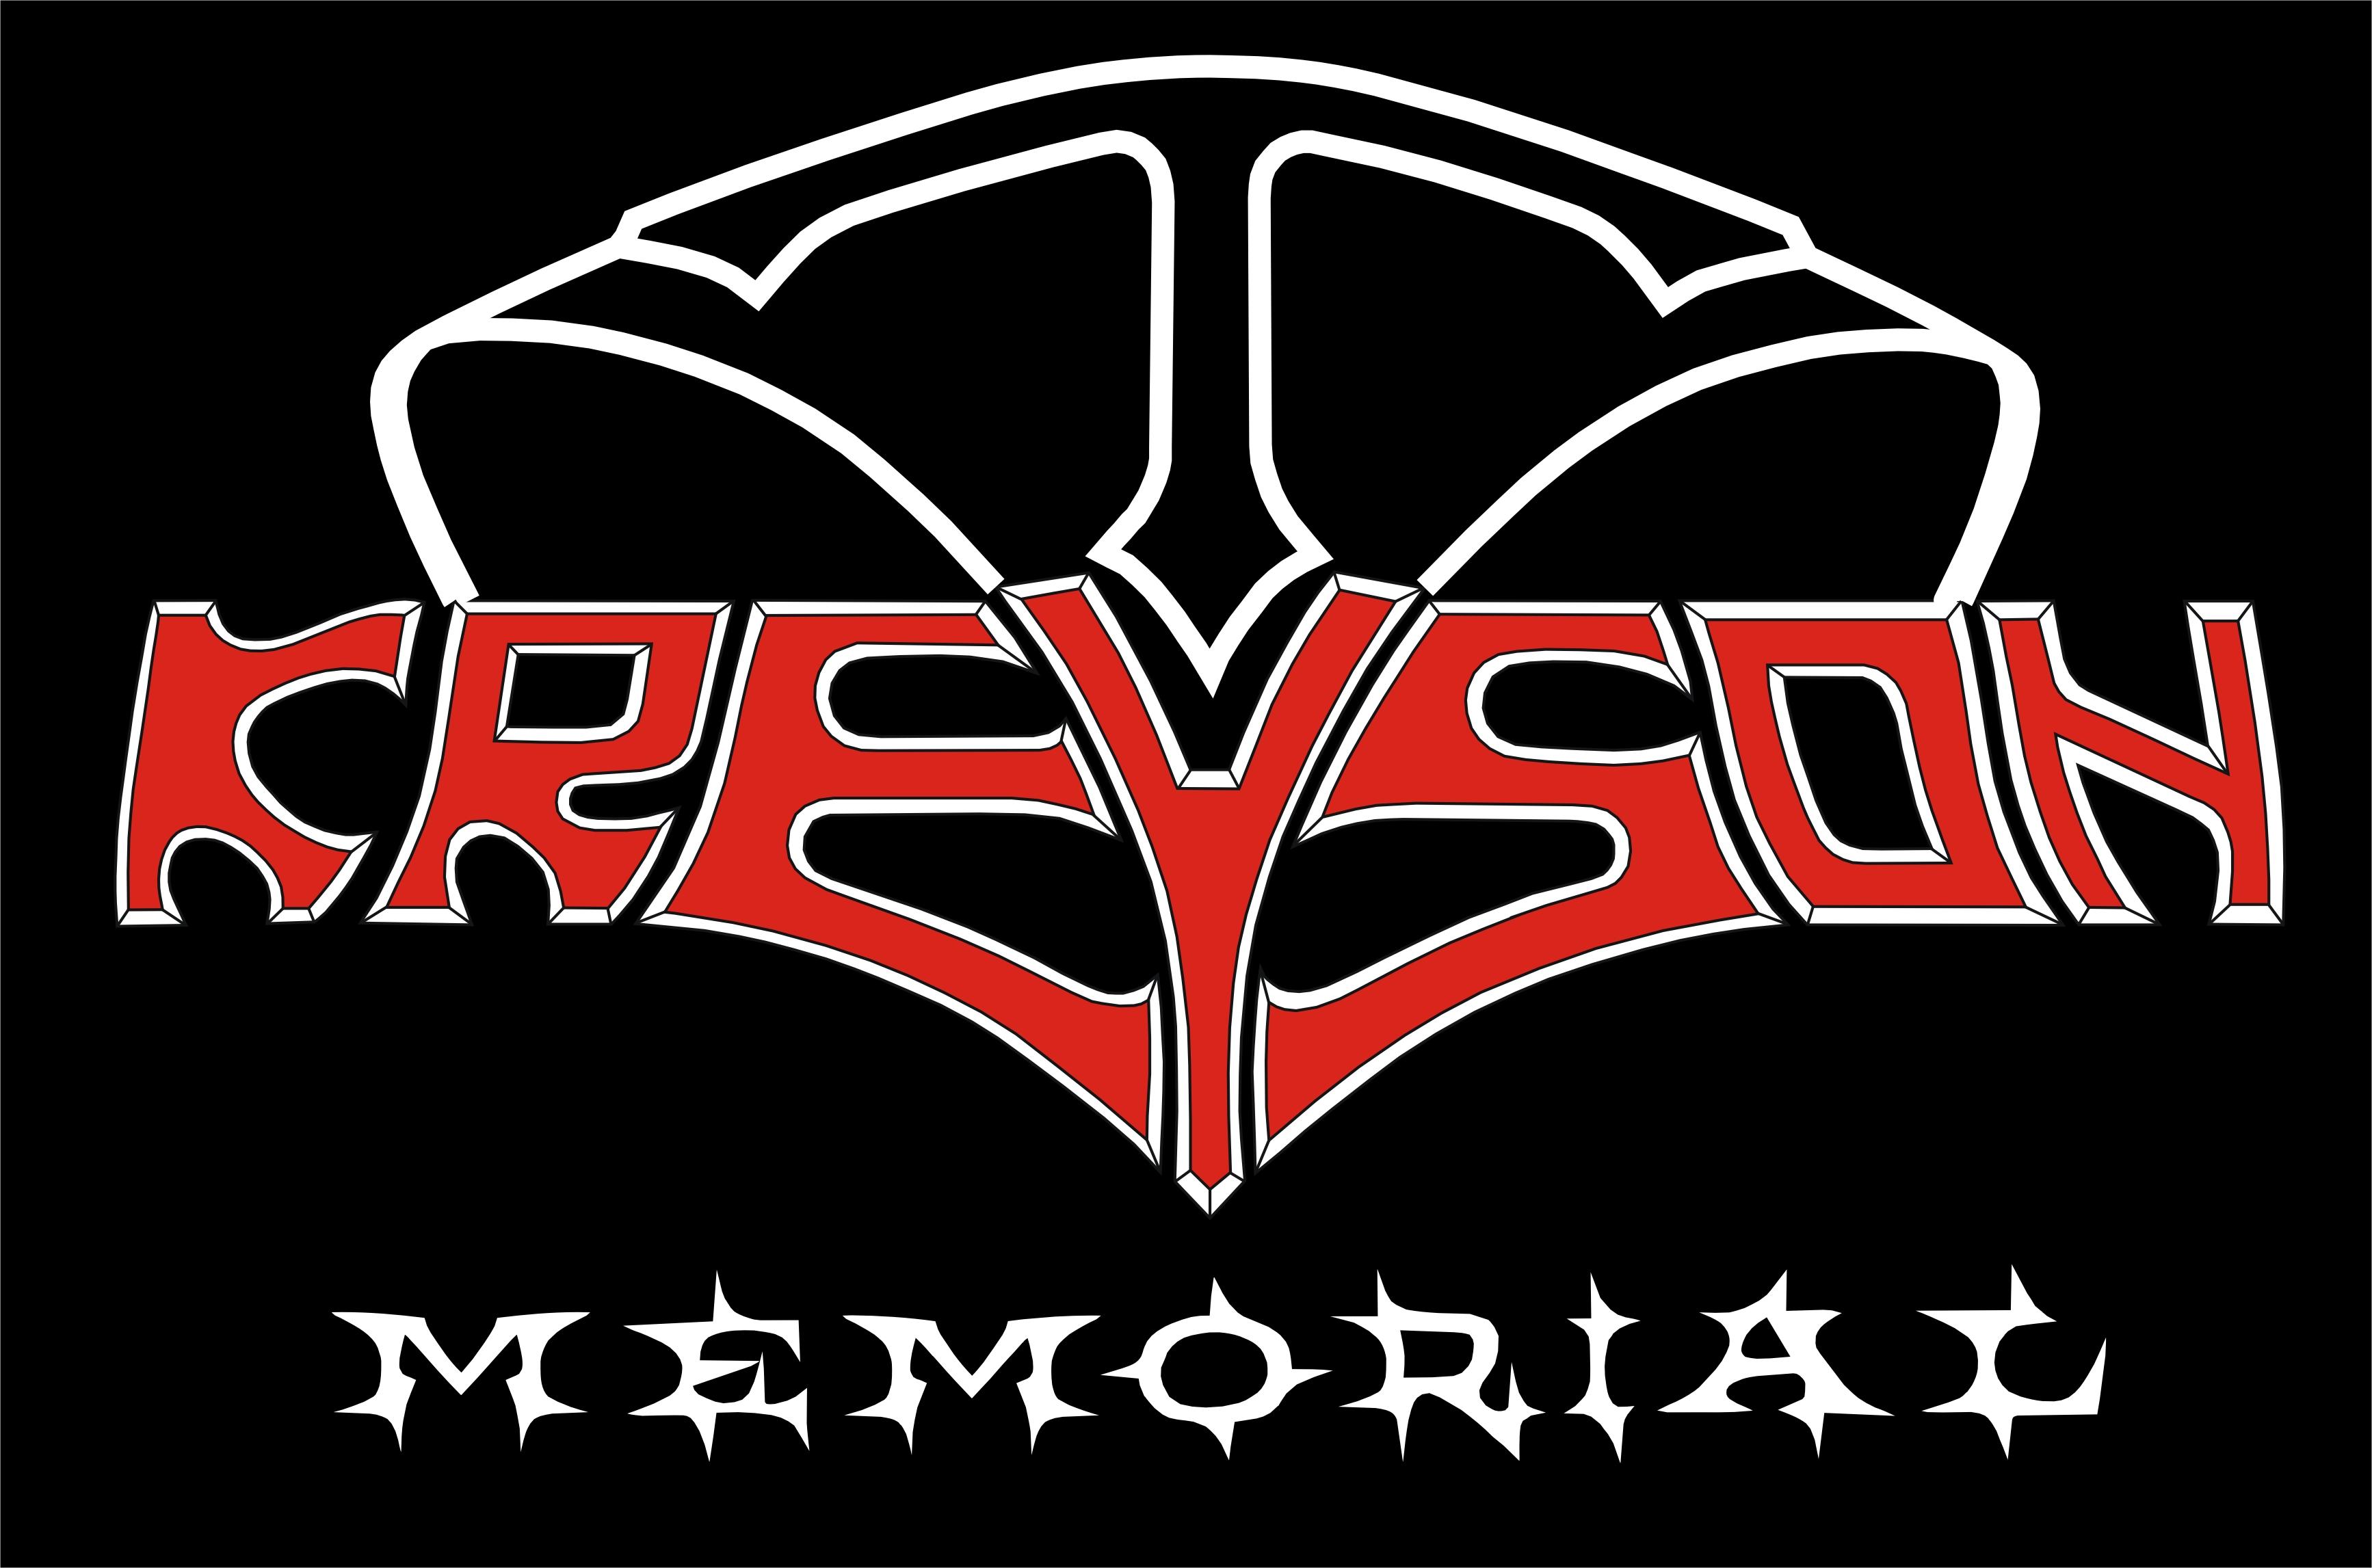 kreyson_memorial_logo_